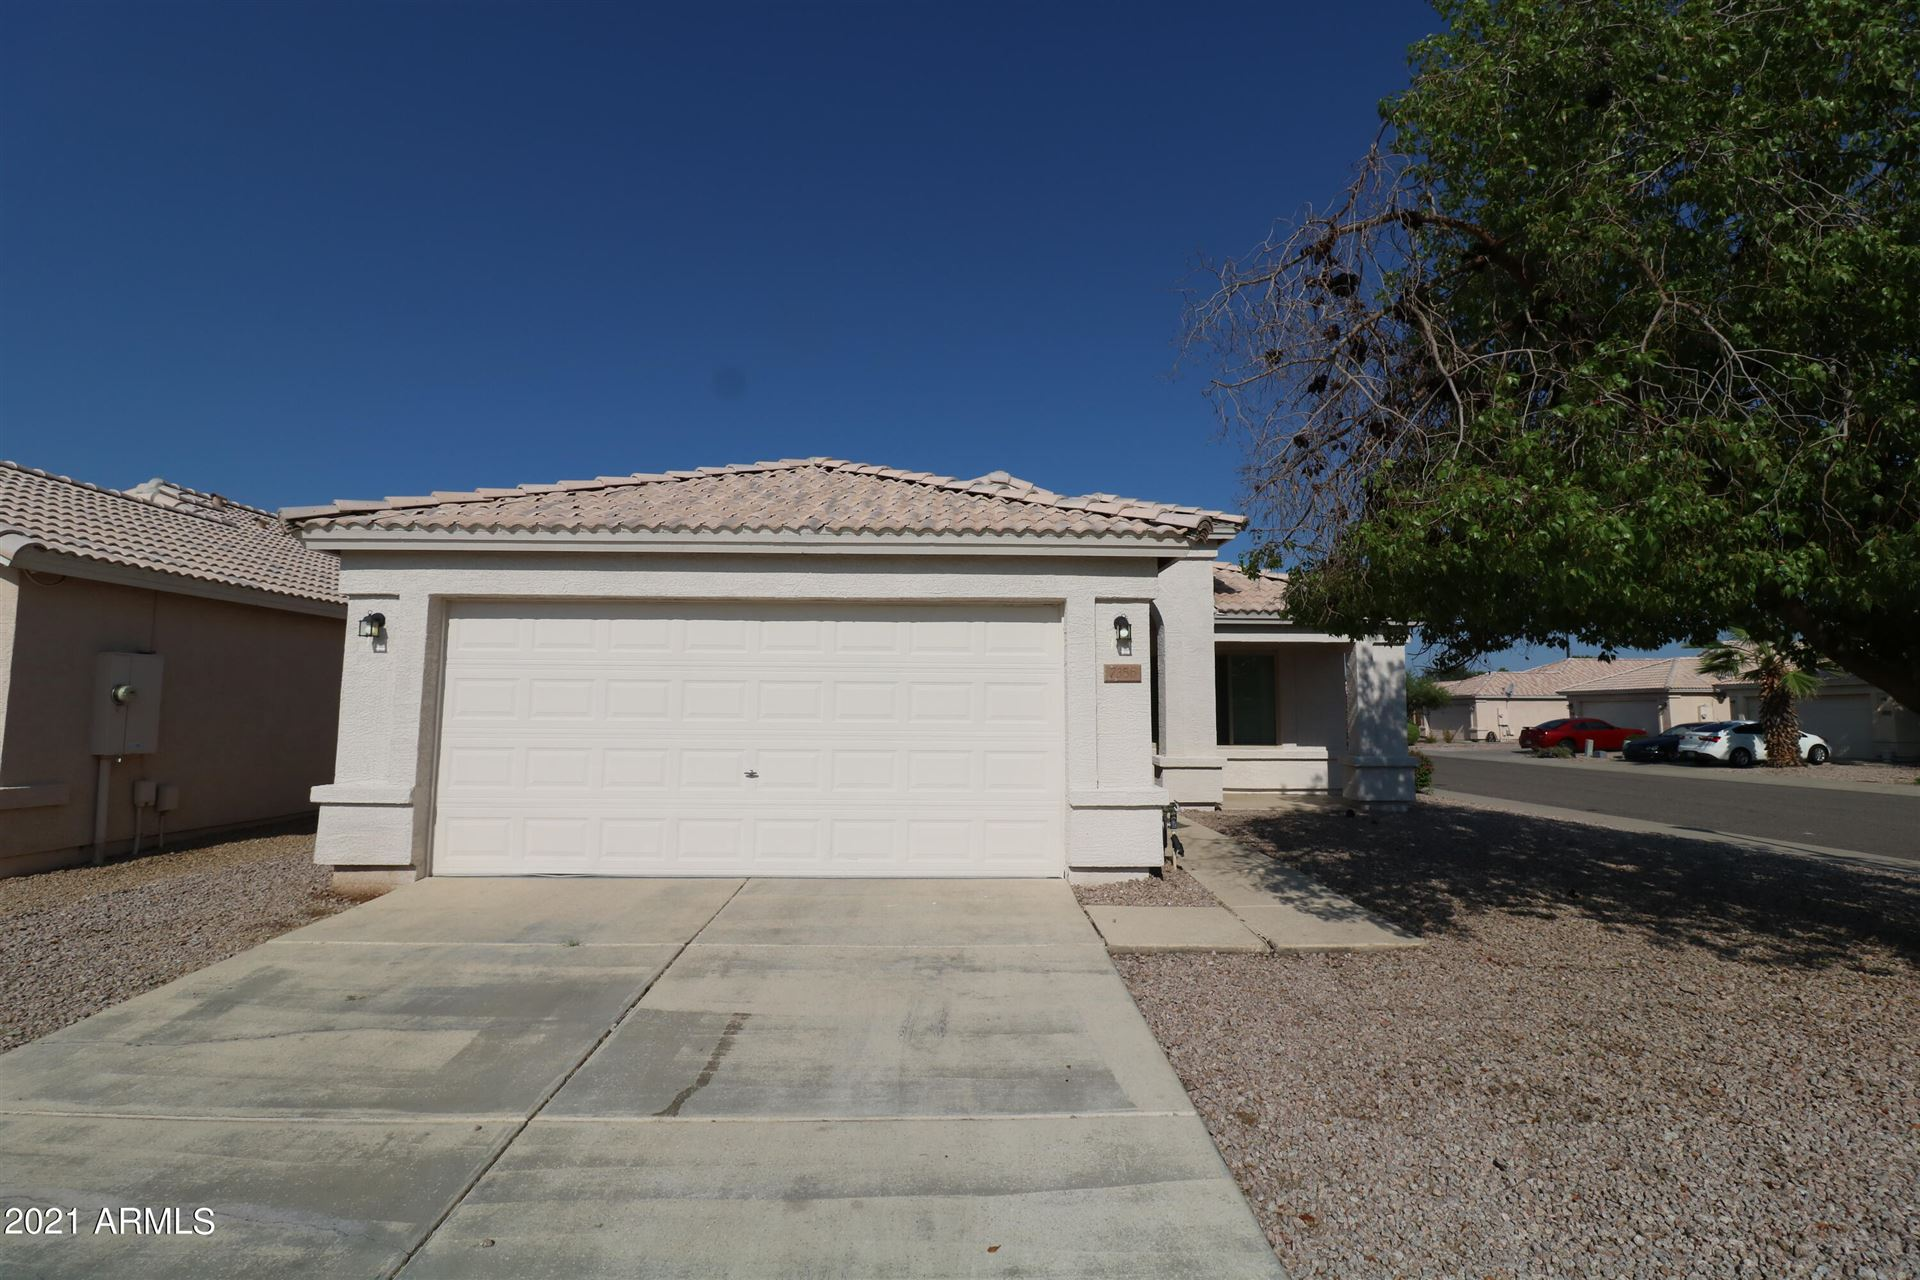 Photo of 7356 N 70TH Avenue, Glendale, AZ 85303 (MLS # 6295919)